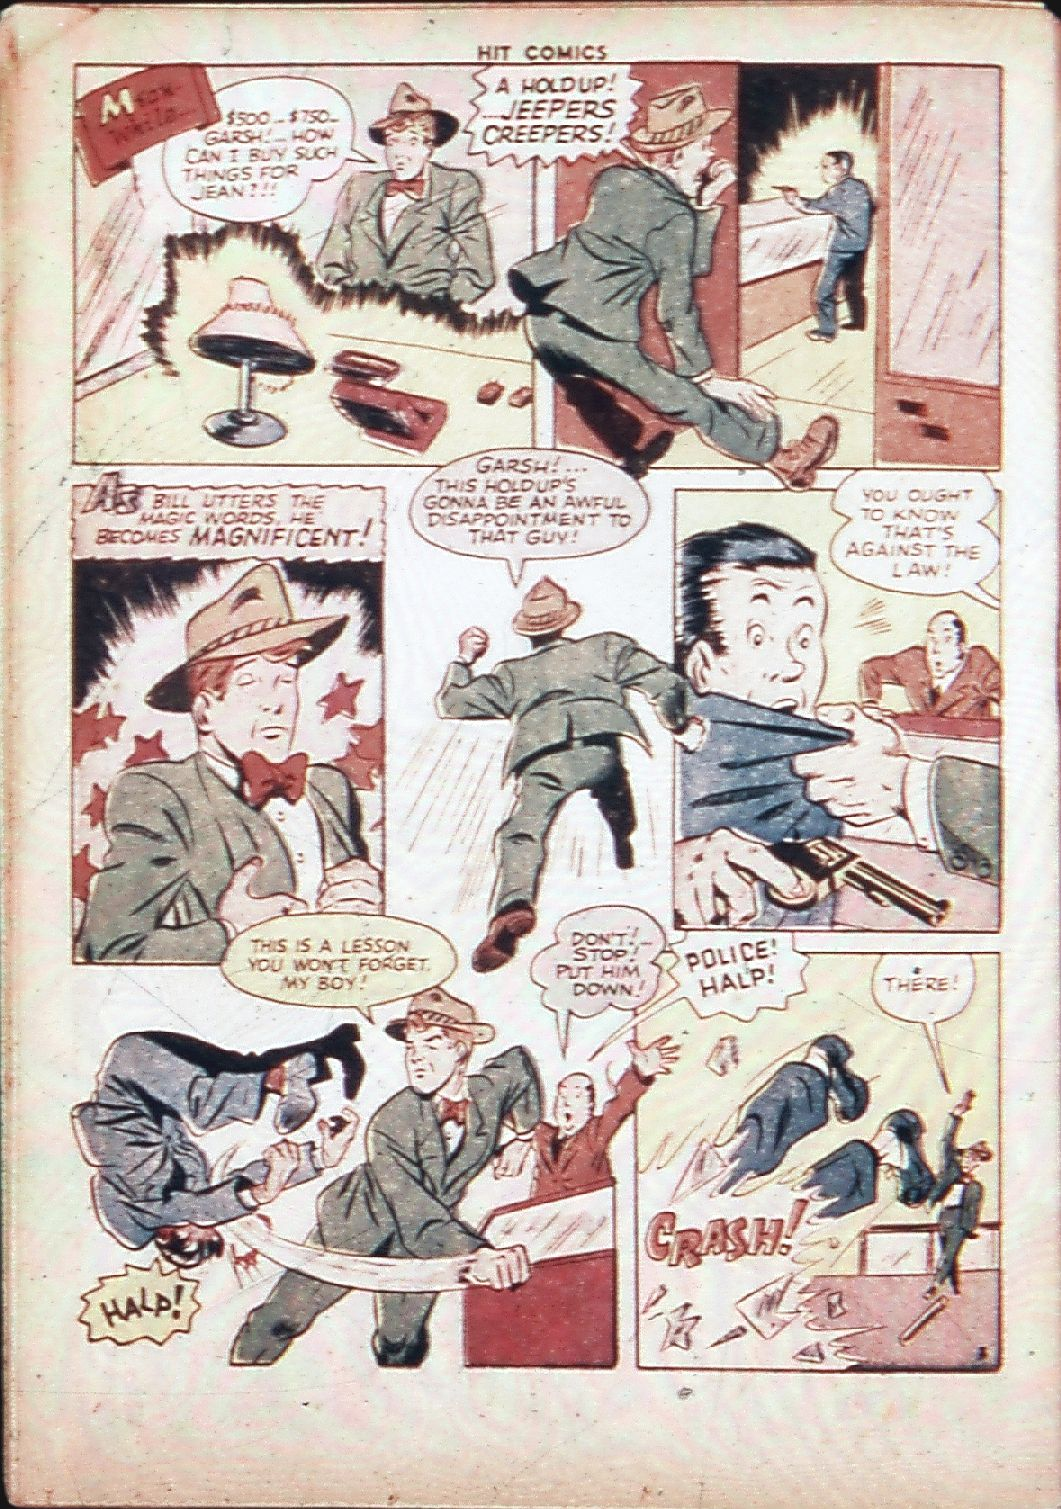 Read online Hit Comics comic -  Issue #30 - 51